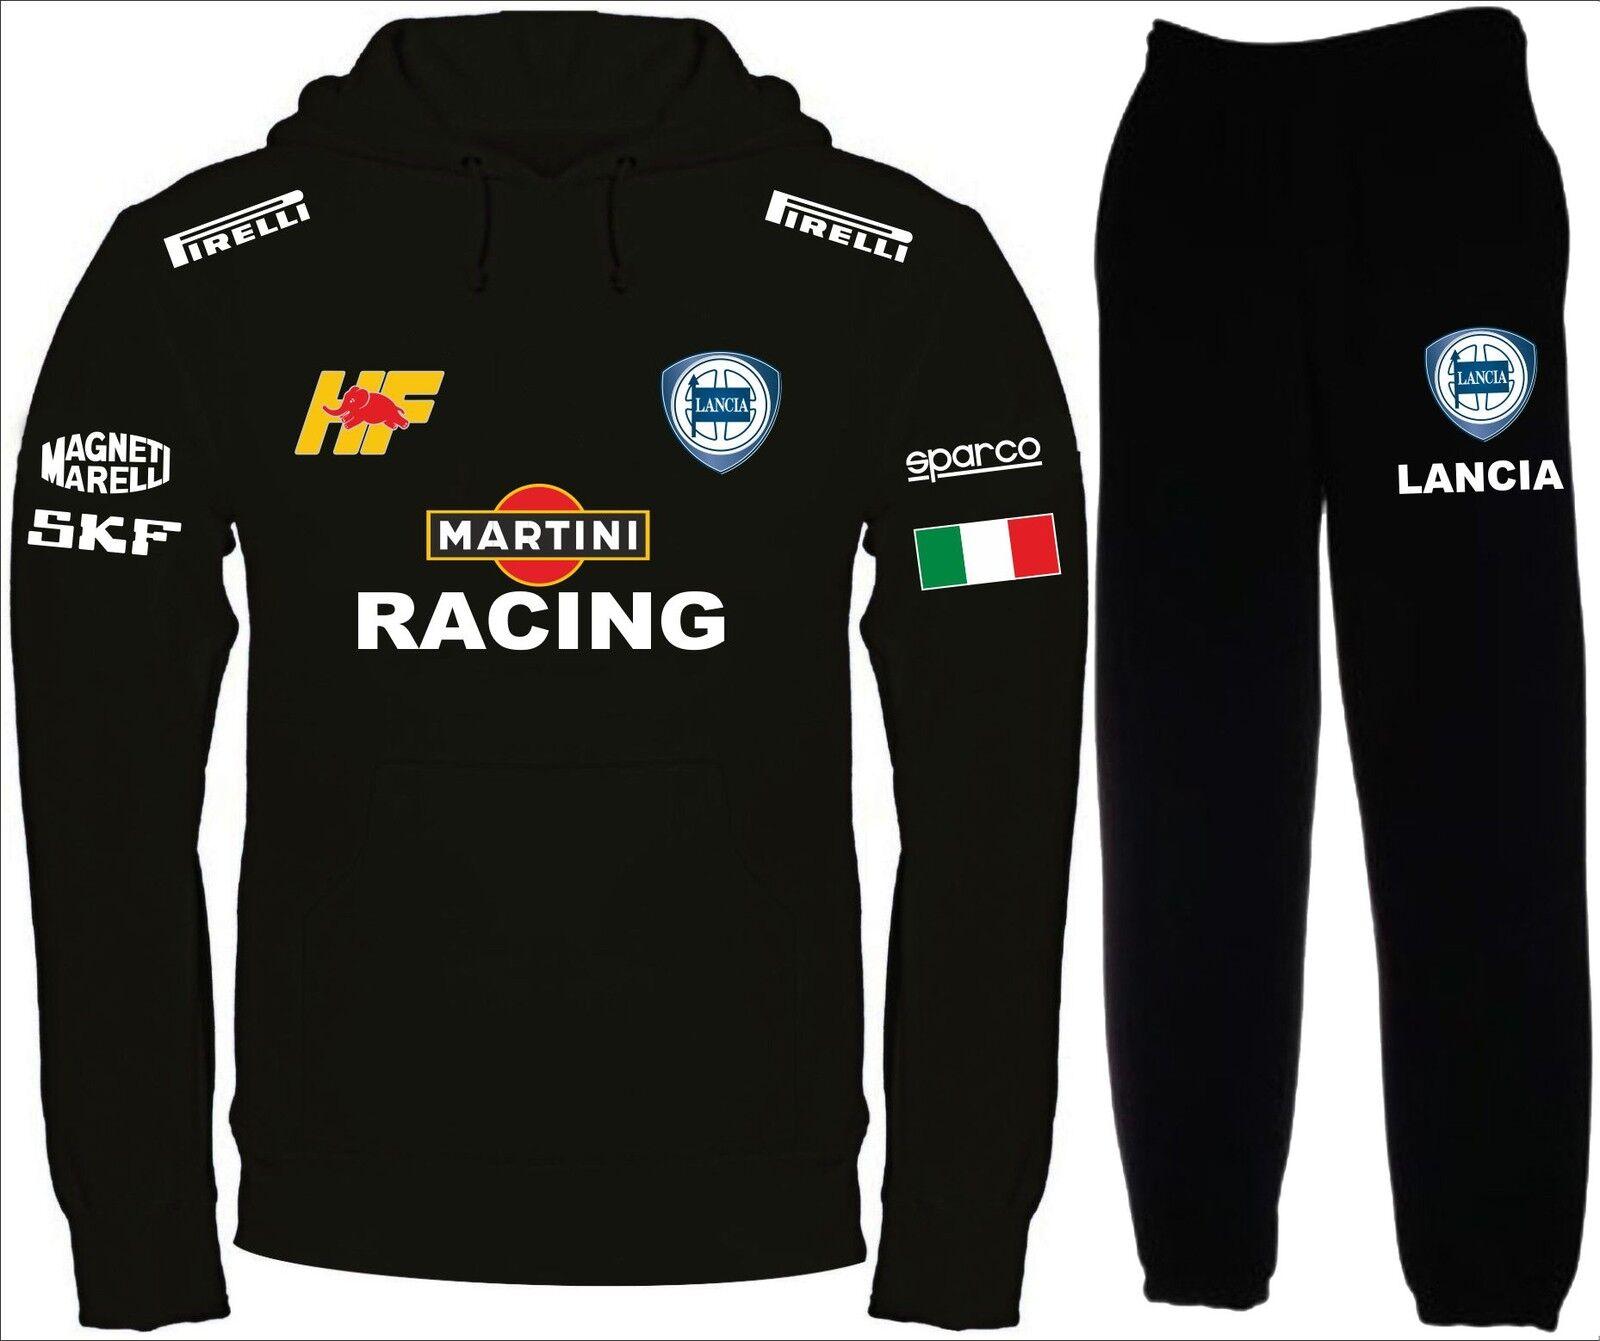 MARTINI RACING TUTA felpa maglietta polo t-shirt maglia hoodie lancia ducati ktm